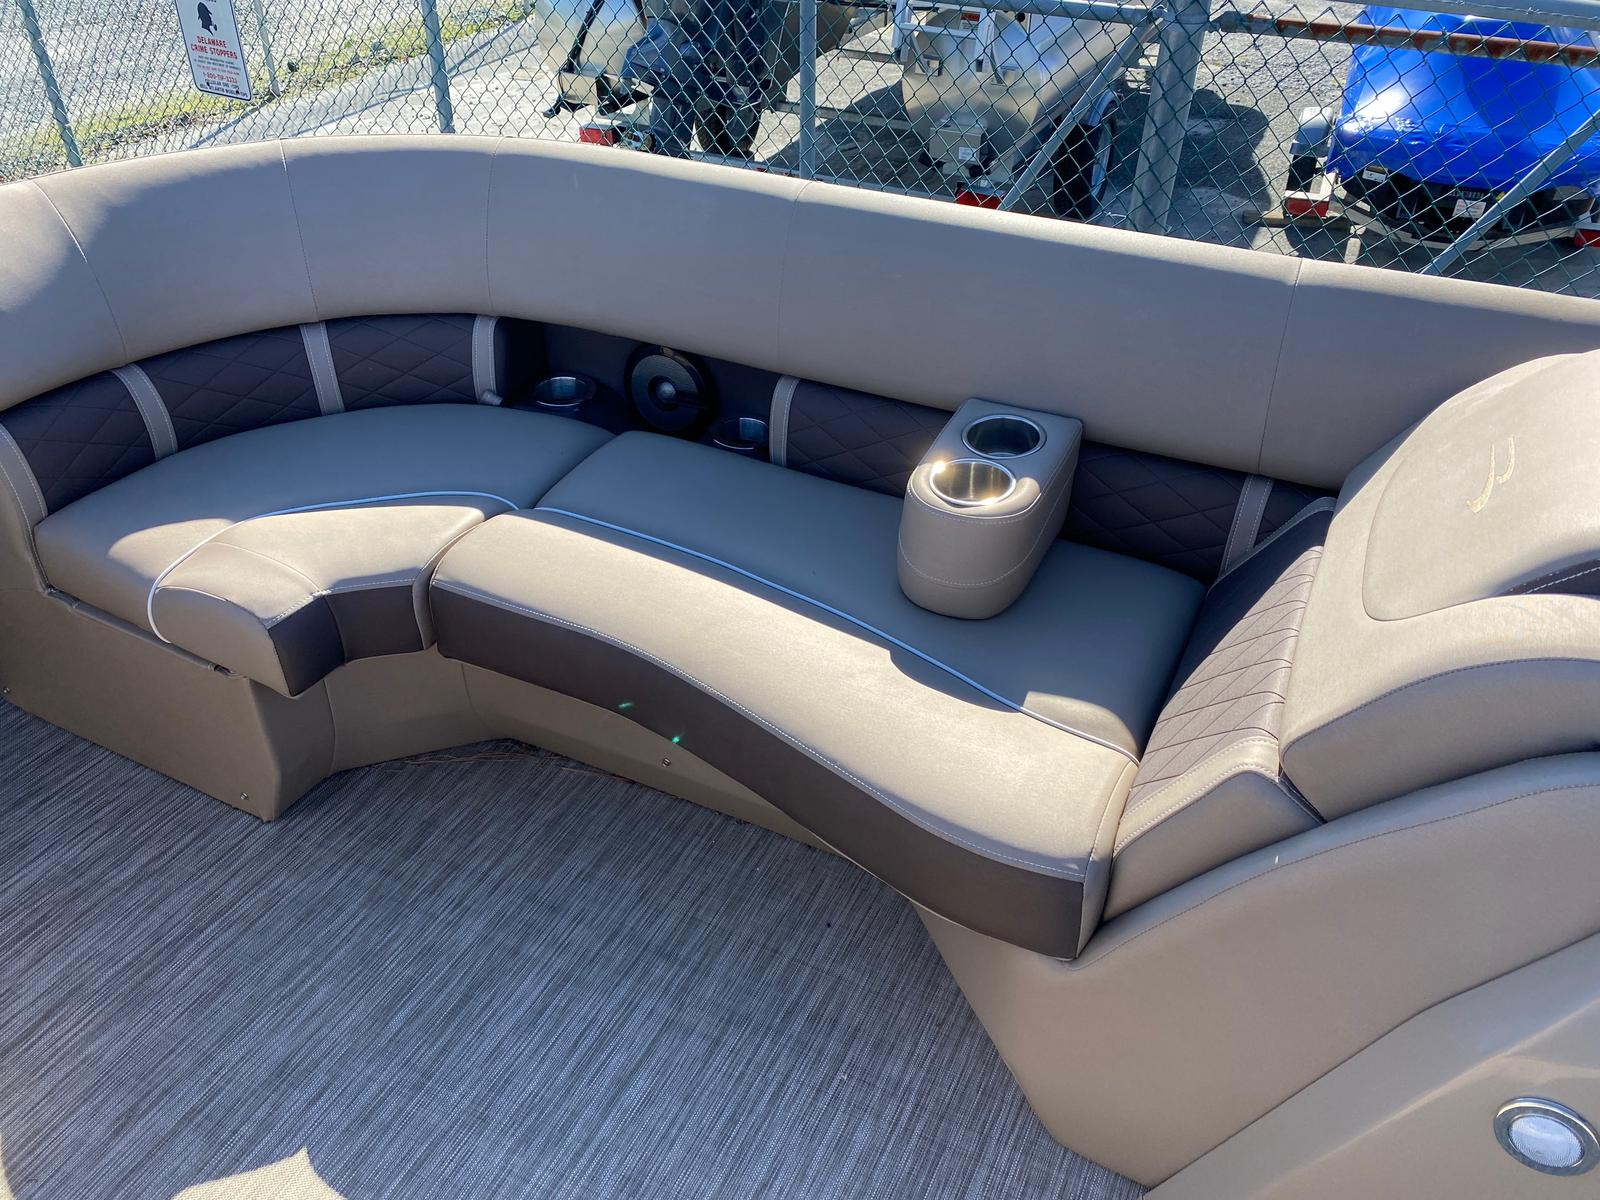 2020 Bennington boat for sale, model of the boat is 22 GSAPG - Dual Stern Gates Pontoon & Image # 12 of 14